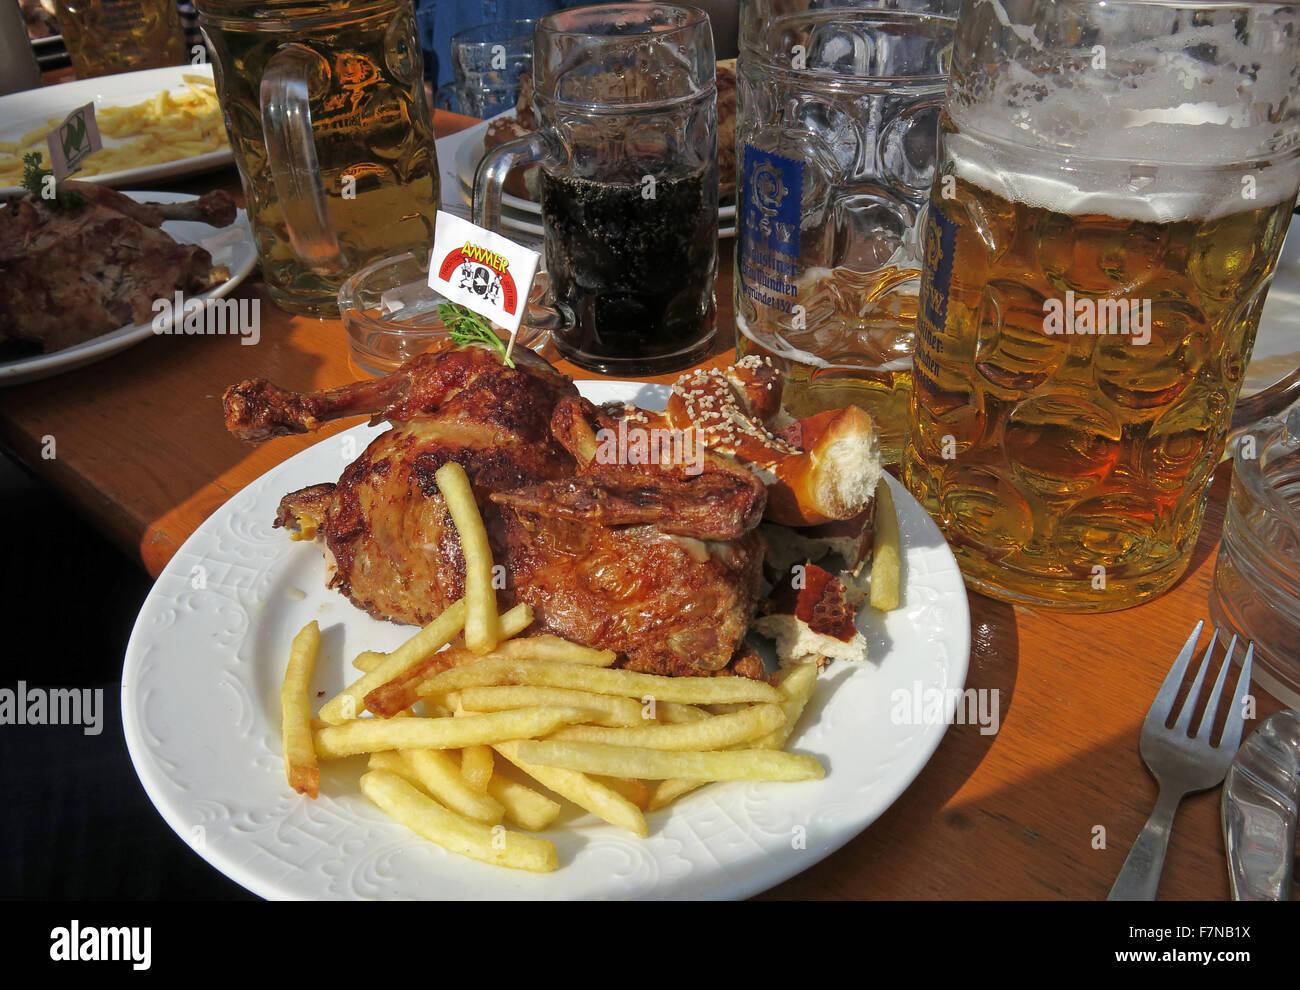 Oktoberfest beer steins and festival food, half chicken & fries, Munich, Germany - Stock Image